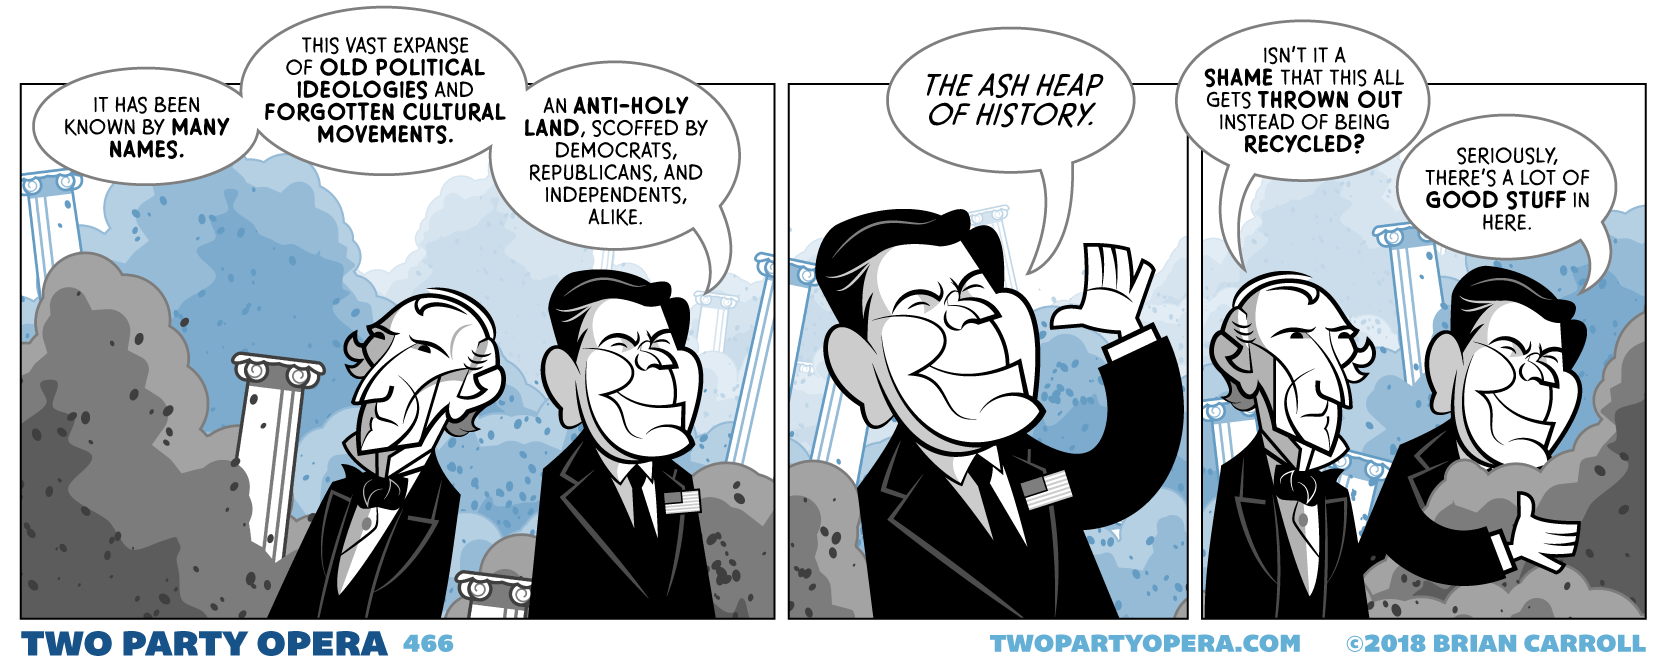 Ash Heap of History